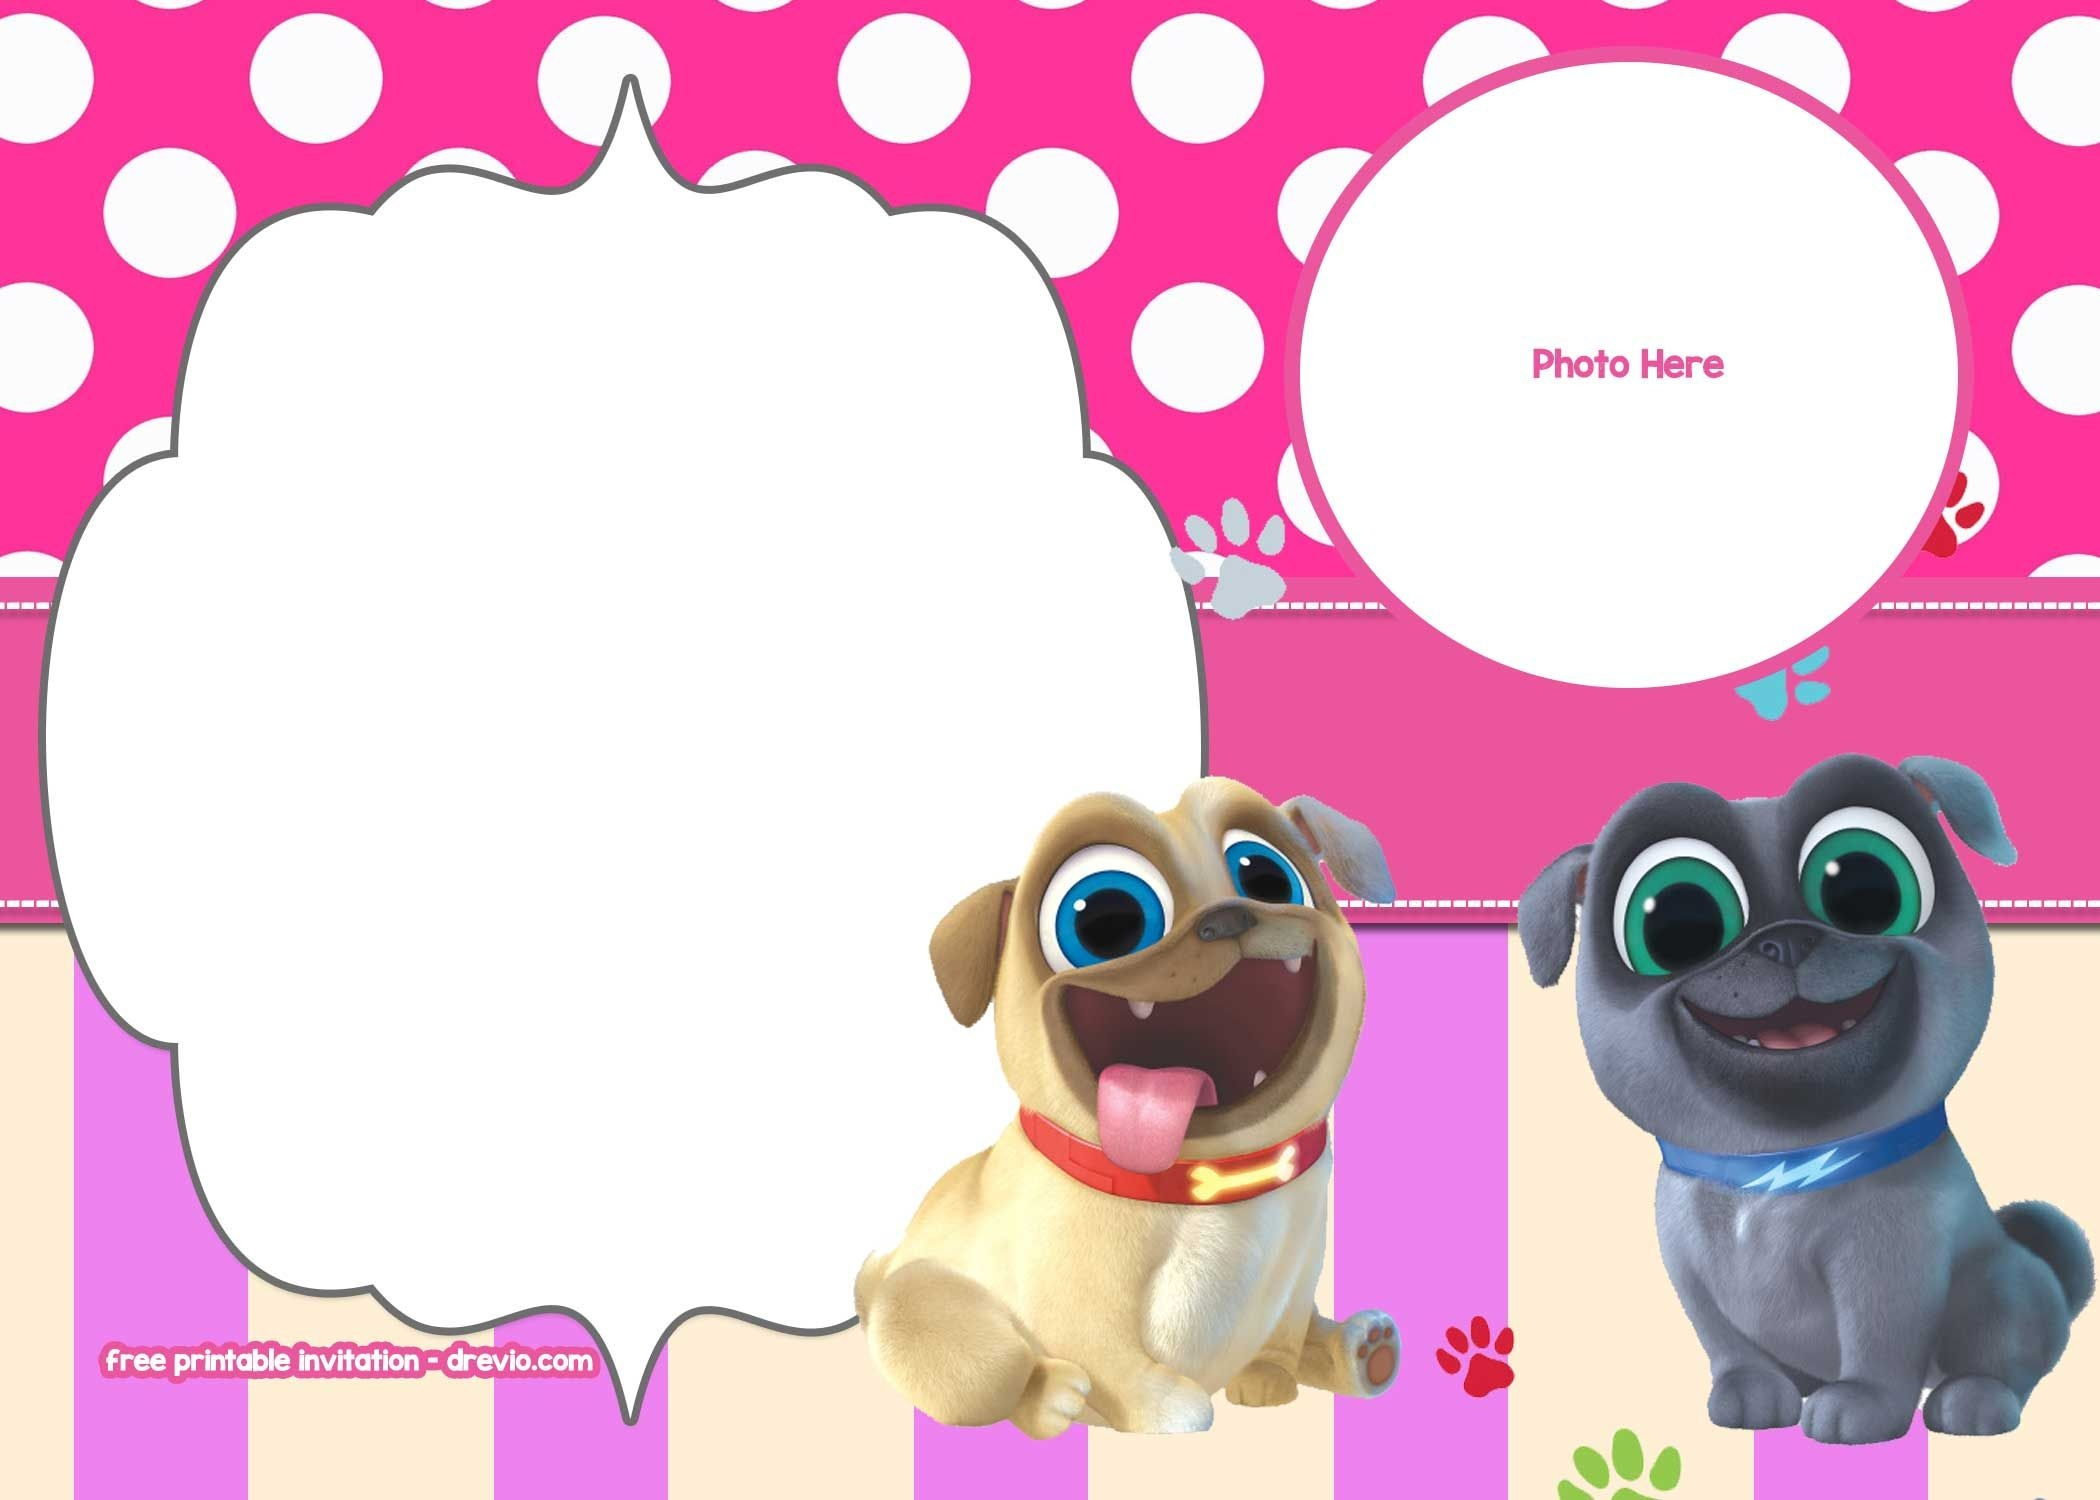 Free Disney Puppy Dog Pals Invitation Templates | Free Printable - Dog Birthday Invitations Free Printable